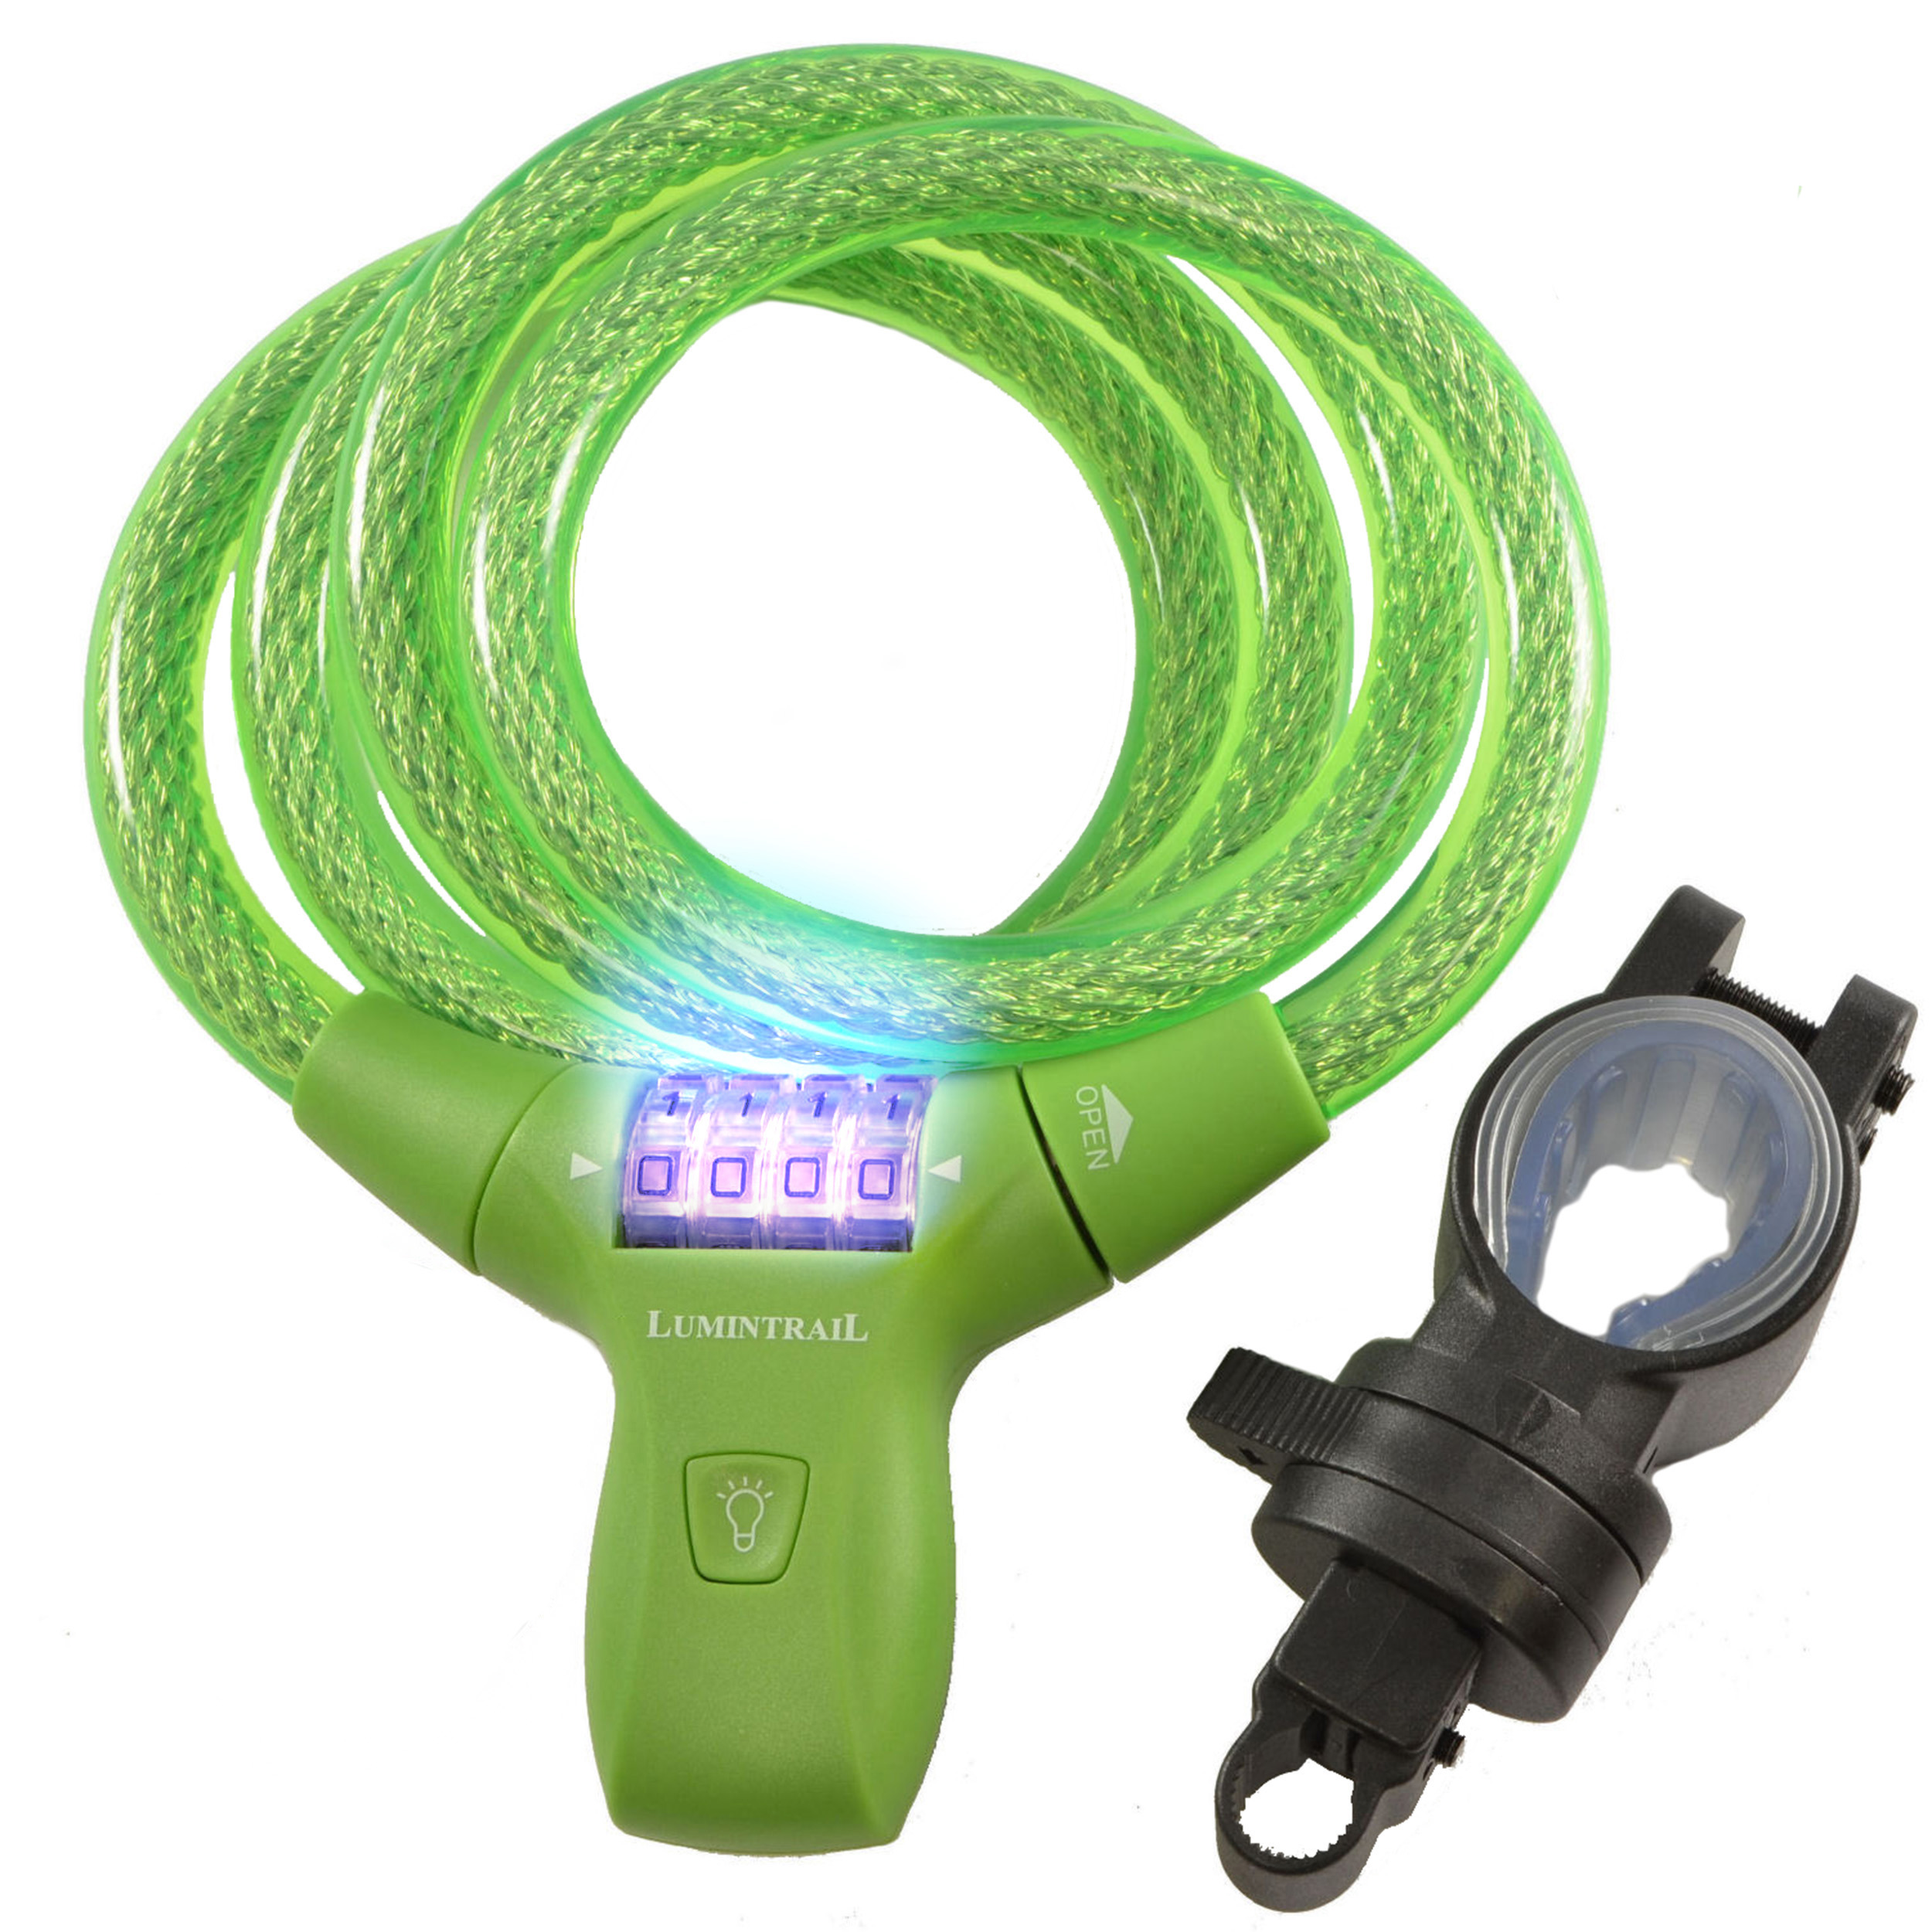 Lumintrail LK21051 Bike Combination Cable Lock w/ LED Illumination & Mounting Bracket GREEN